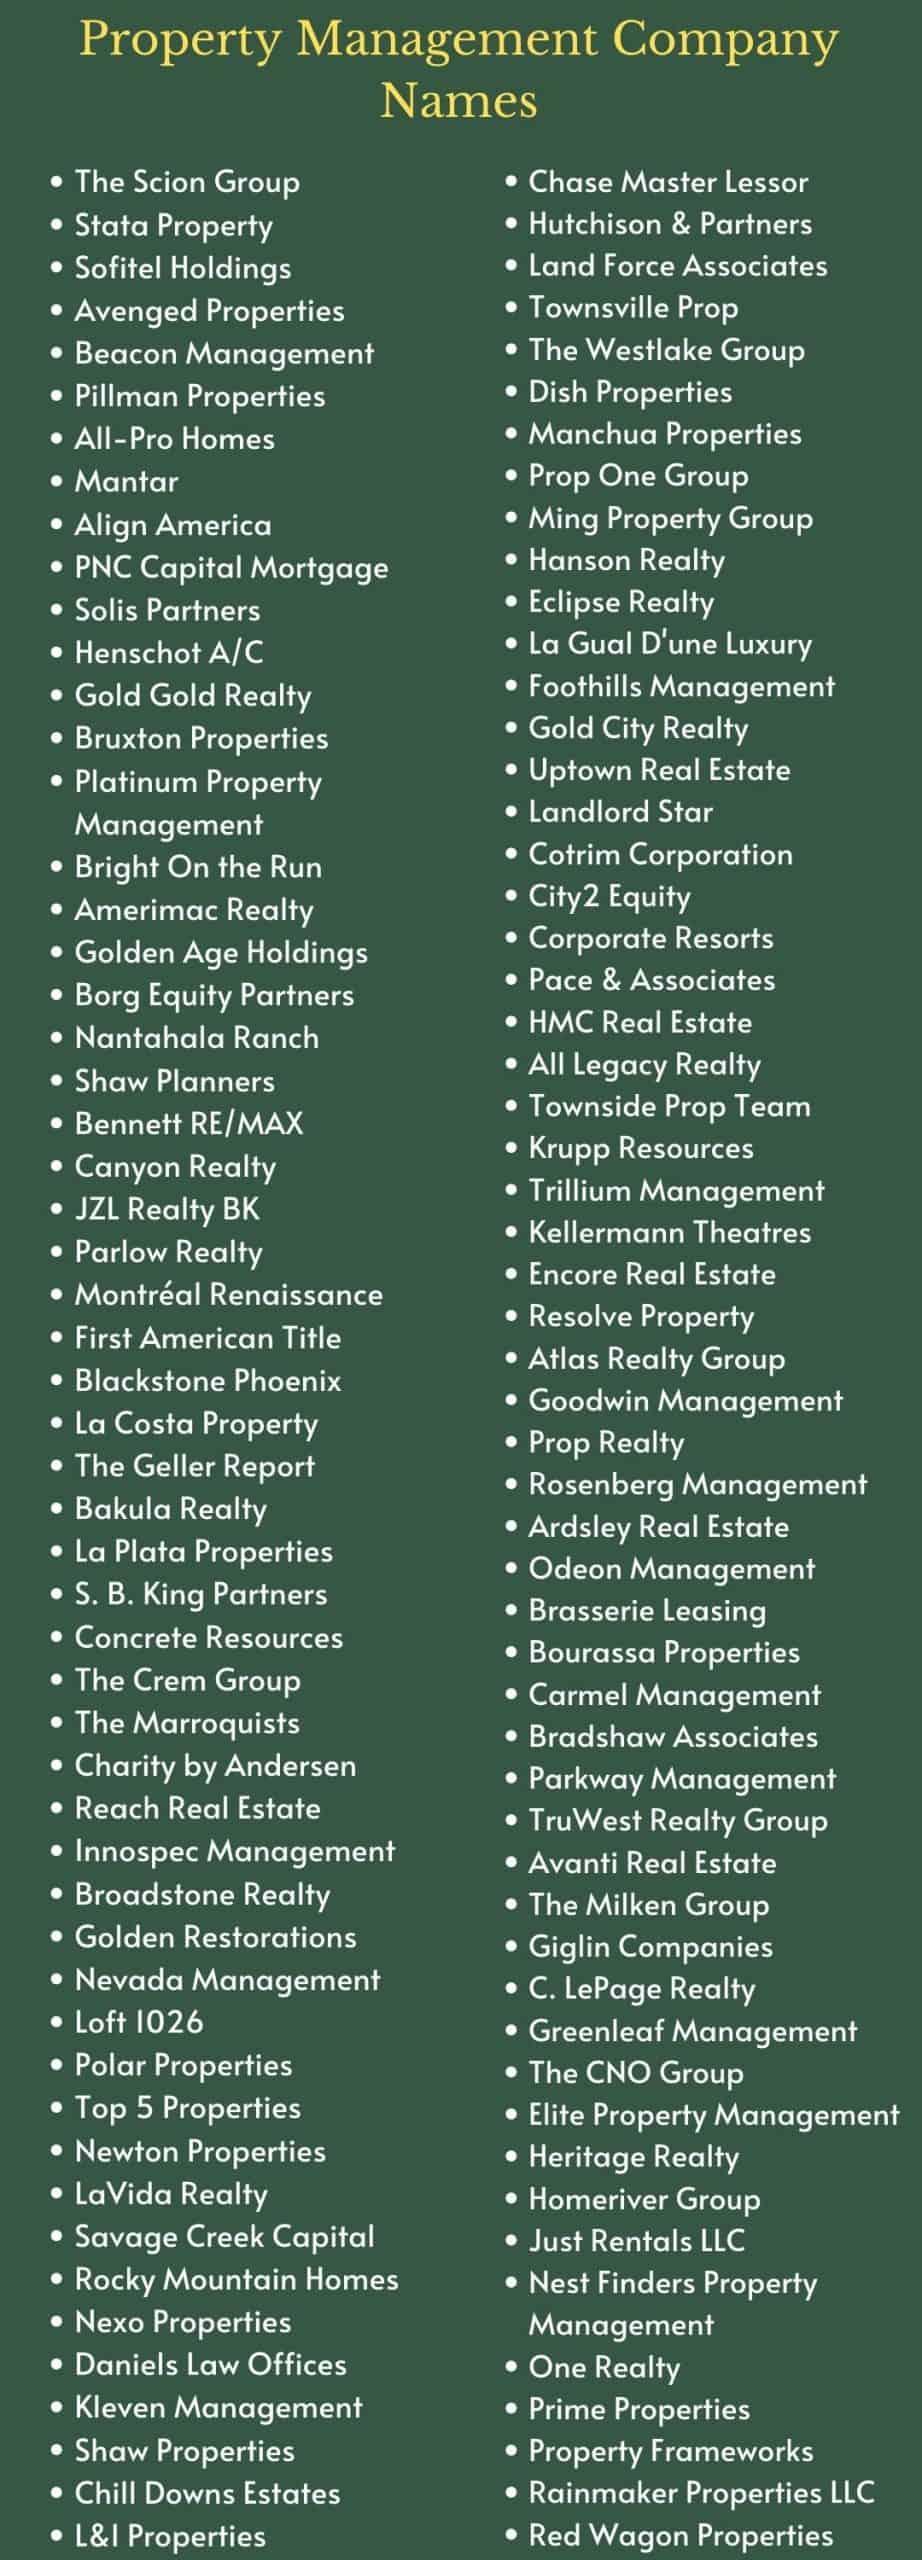 Property Management Company Names